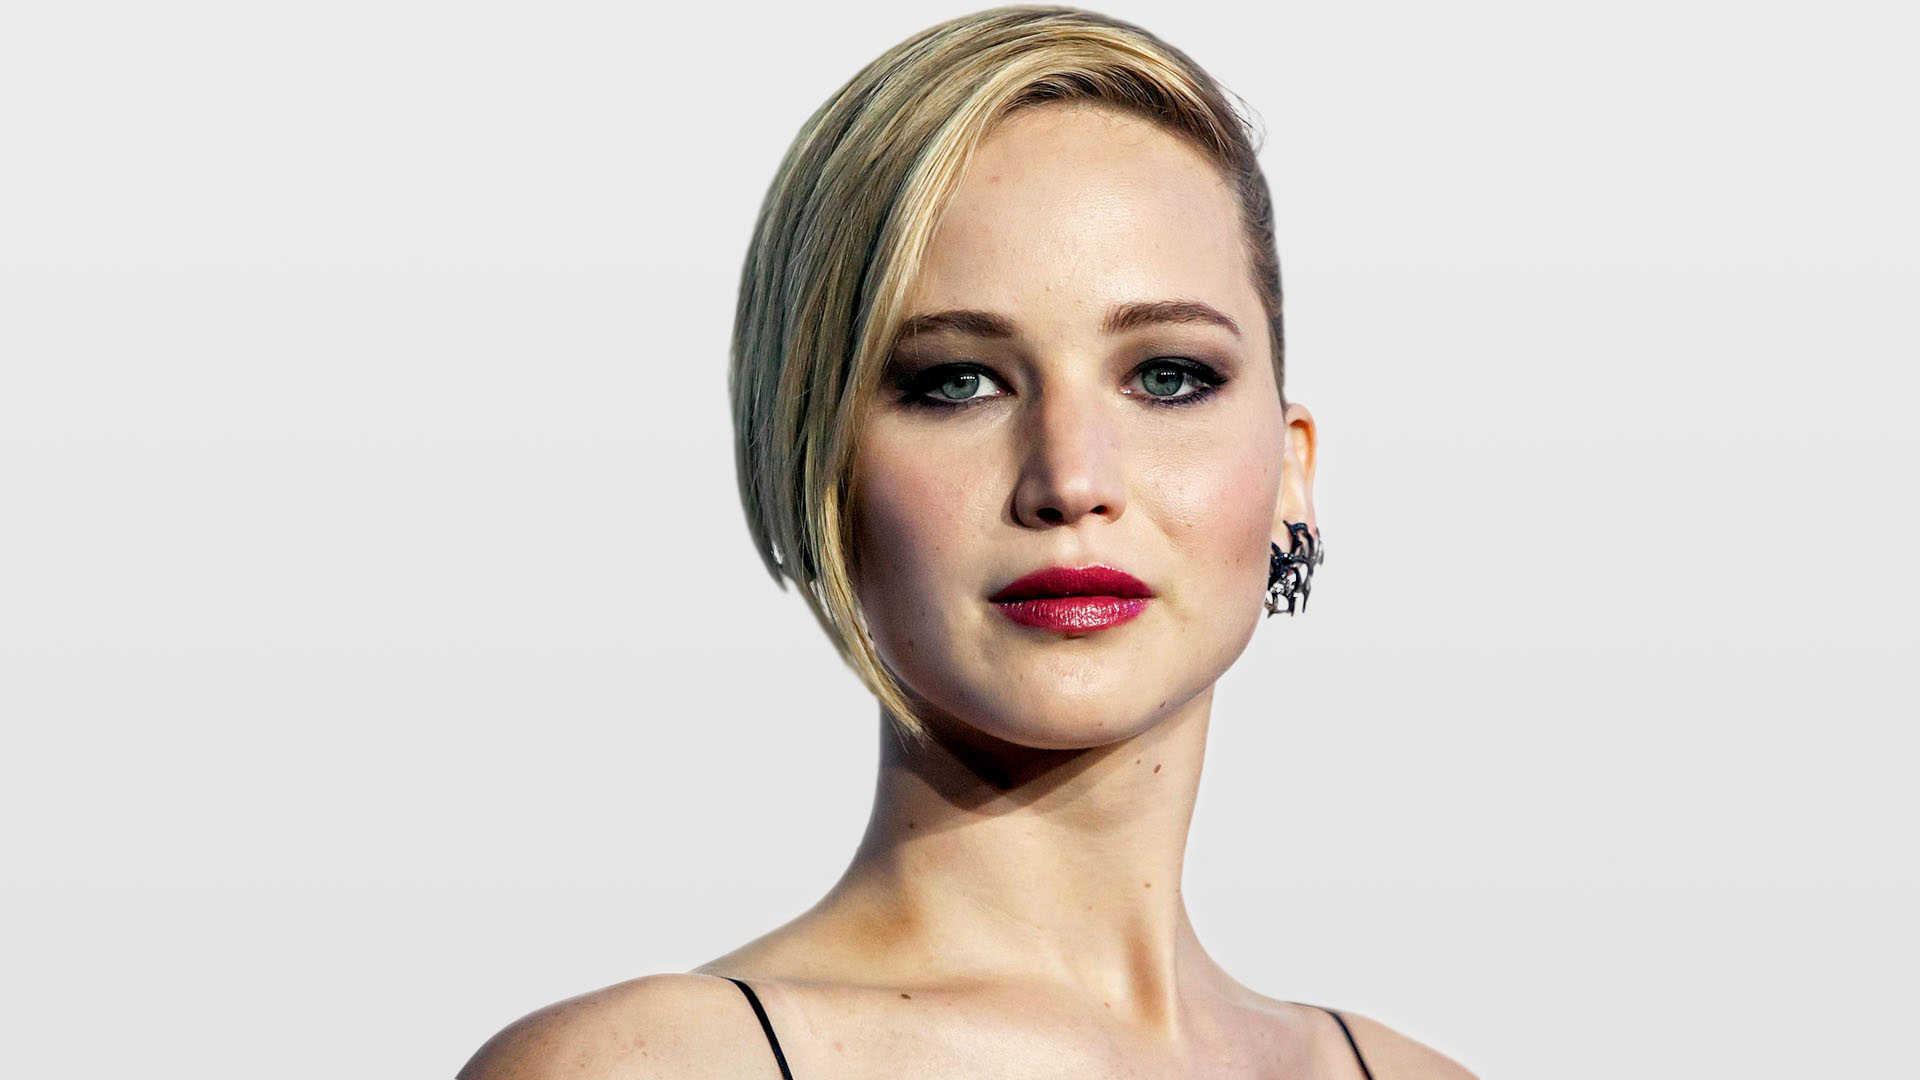 Jennifer Lawrence Haircut 2014. Jennifer Lawrence Wallpaper 1920×1080